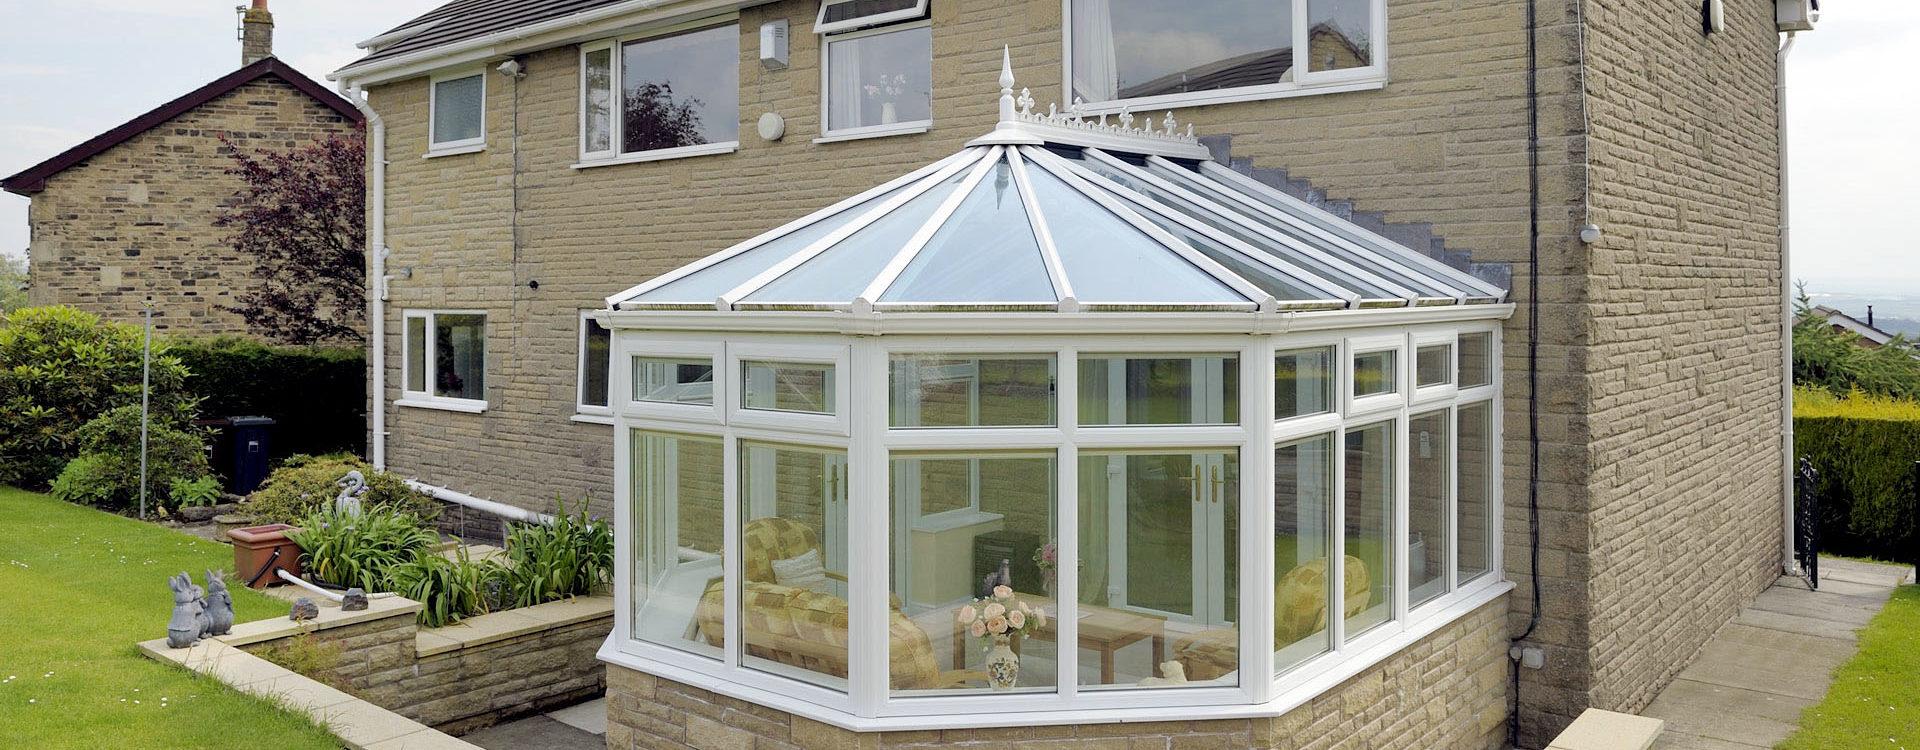 triple glazing croydon conservatory